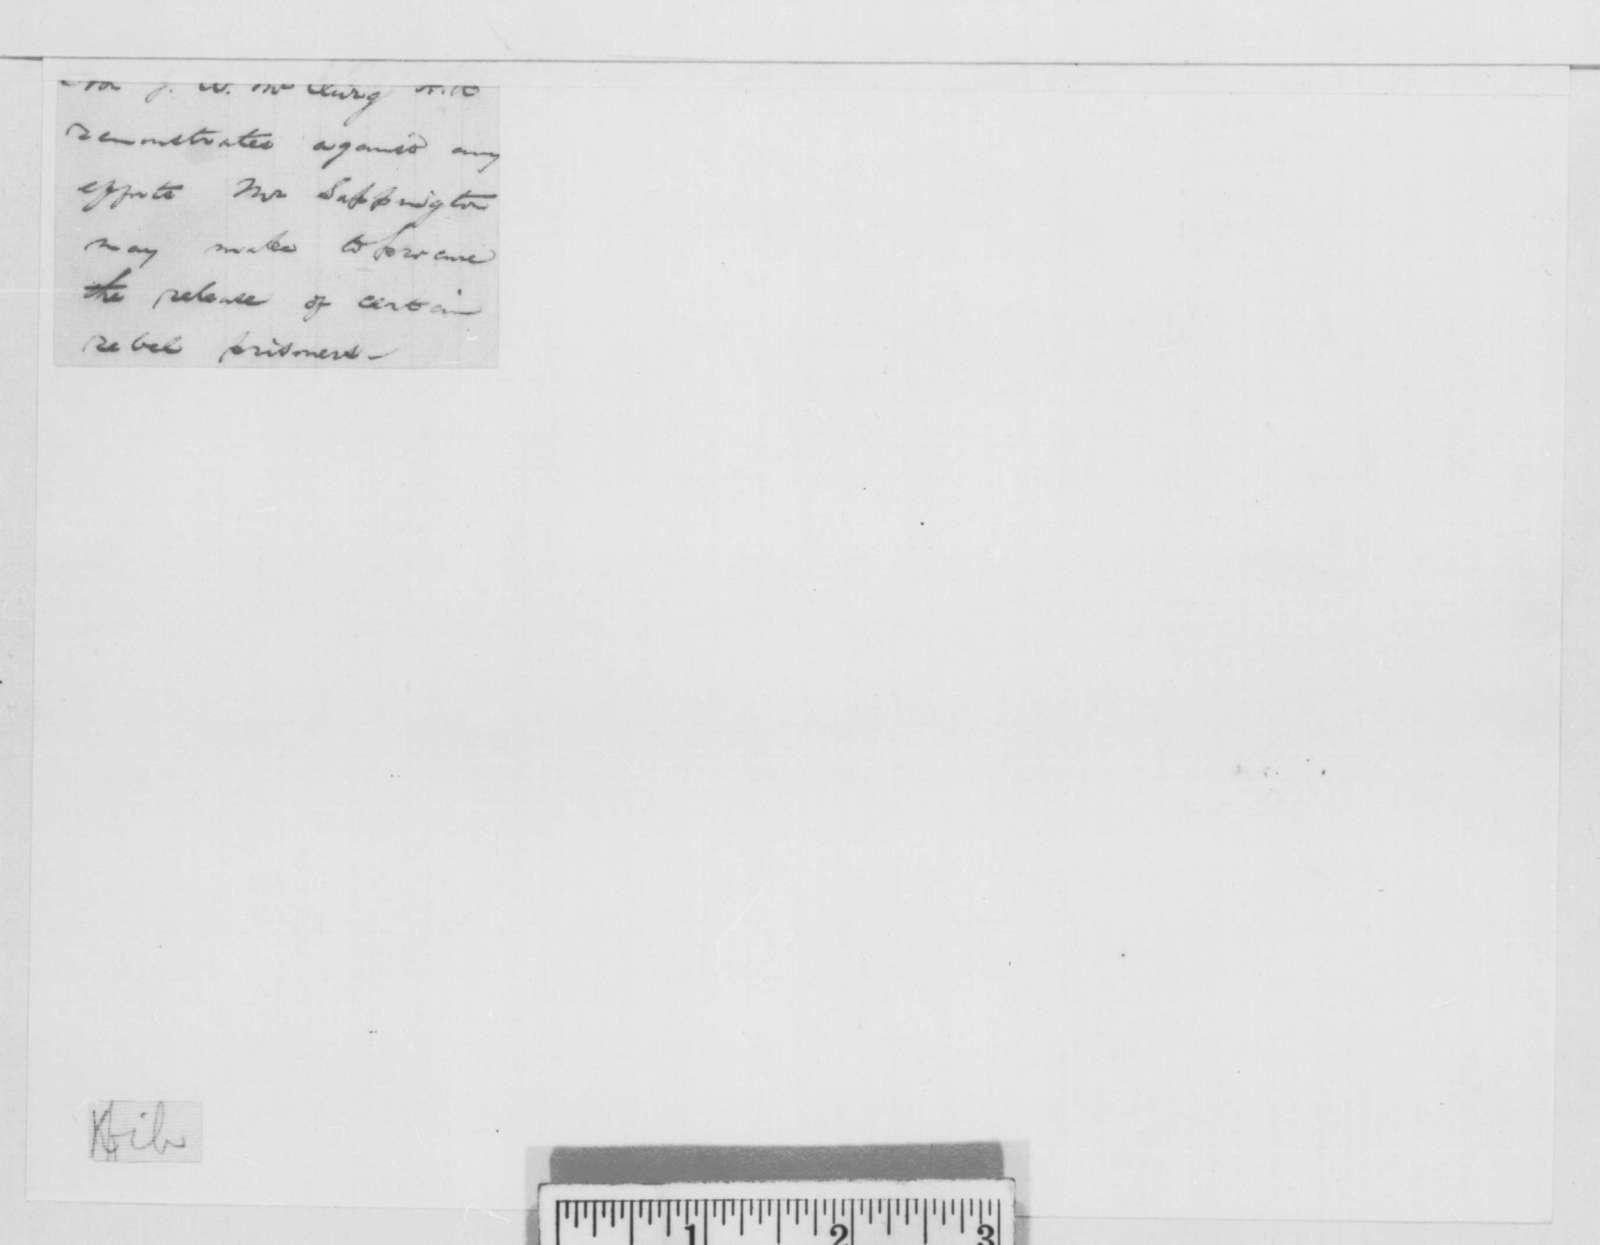 J. N. E. Moser to Joseph W. McClurg, Wednesday, January 25, 1865  (Release of rebel prisoners)